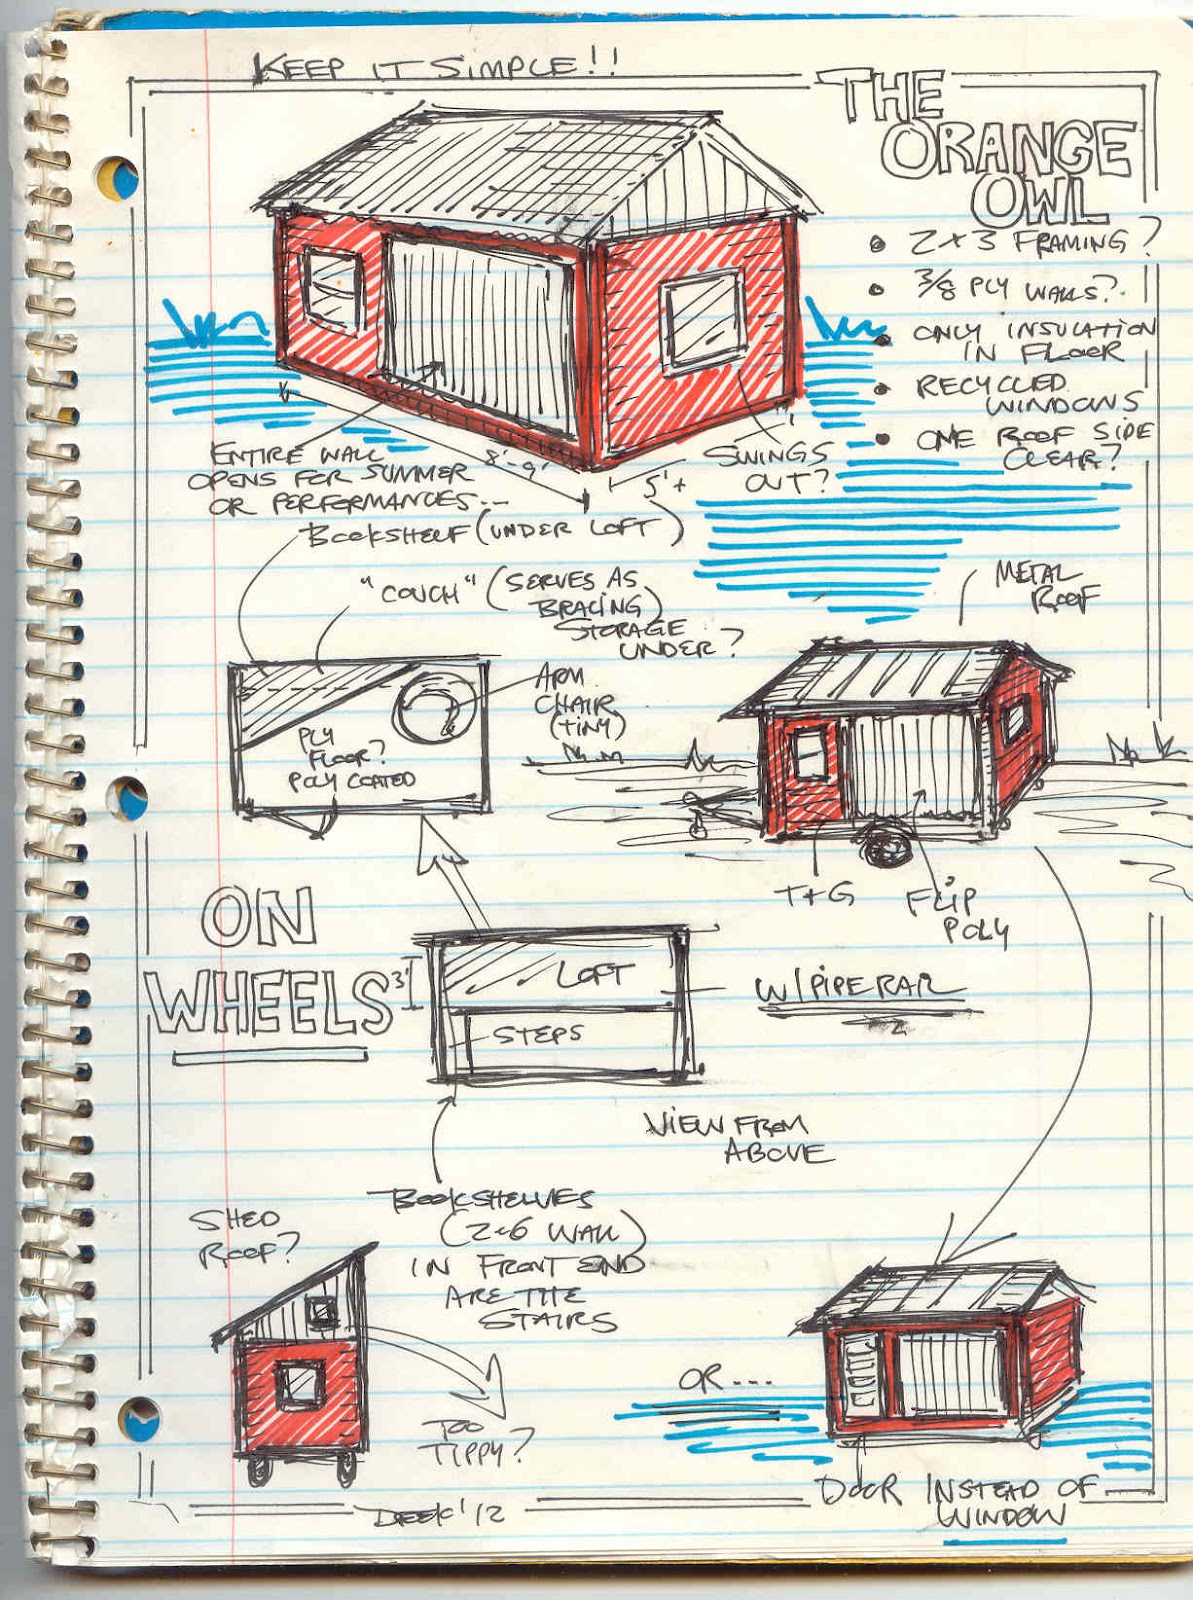 The Orange Owl Tiny House